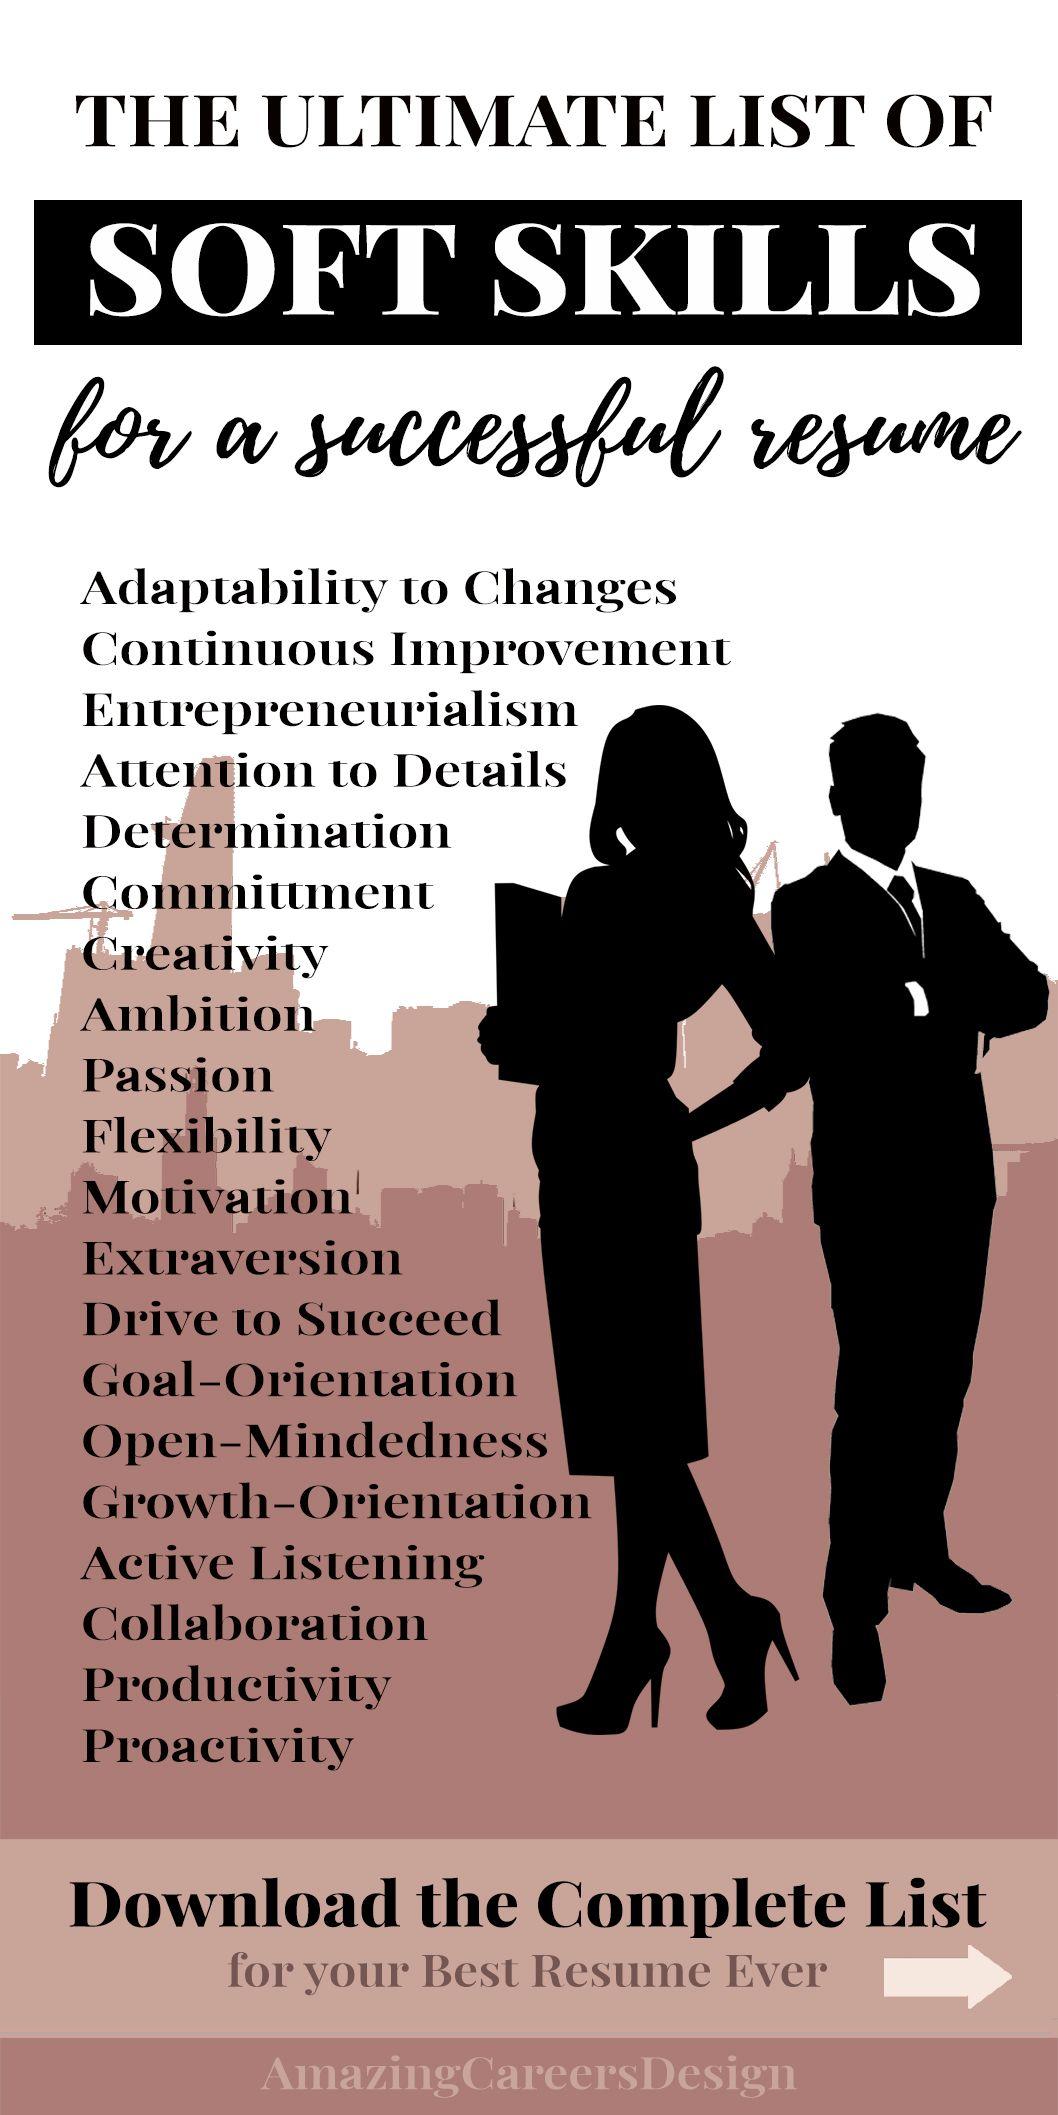 Soft Skills Resume Tips Soft Skills Examples For Resume Skill Section Best Guide For Skills On Resume How To Write A Resume Resume Skills Section Soft Skills Resume Skills